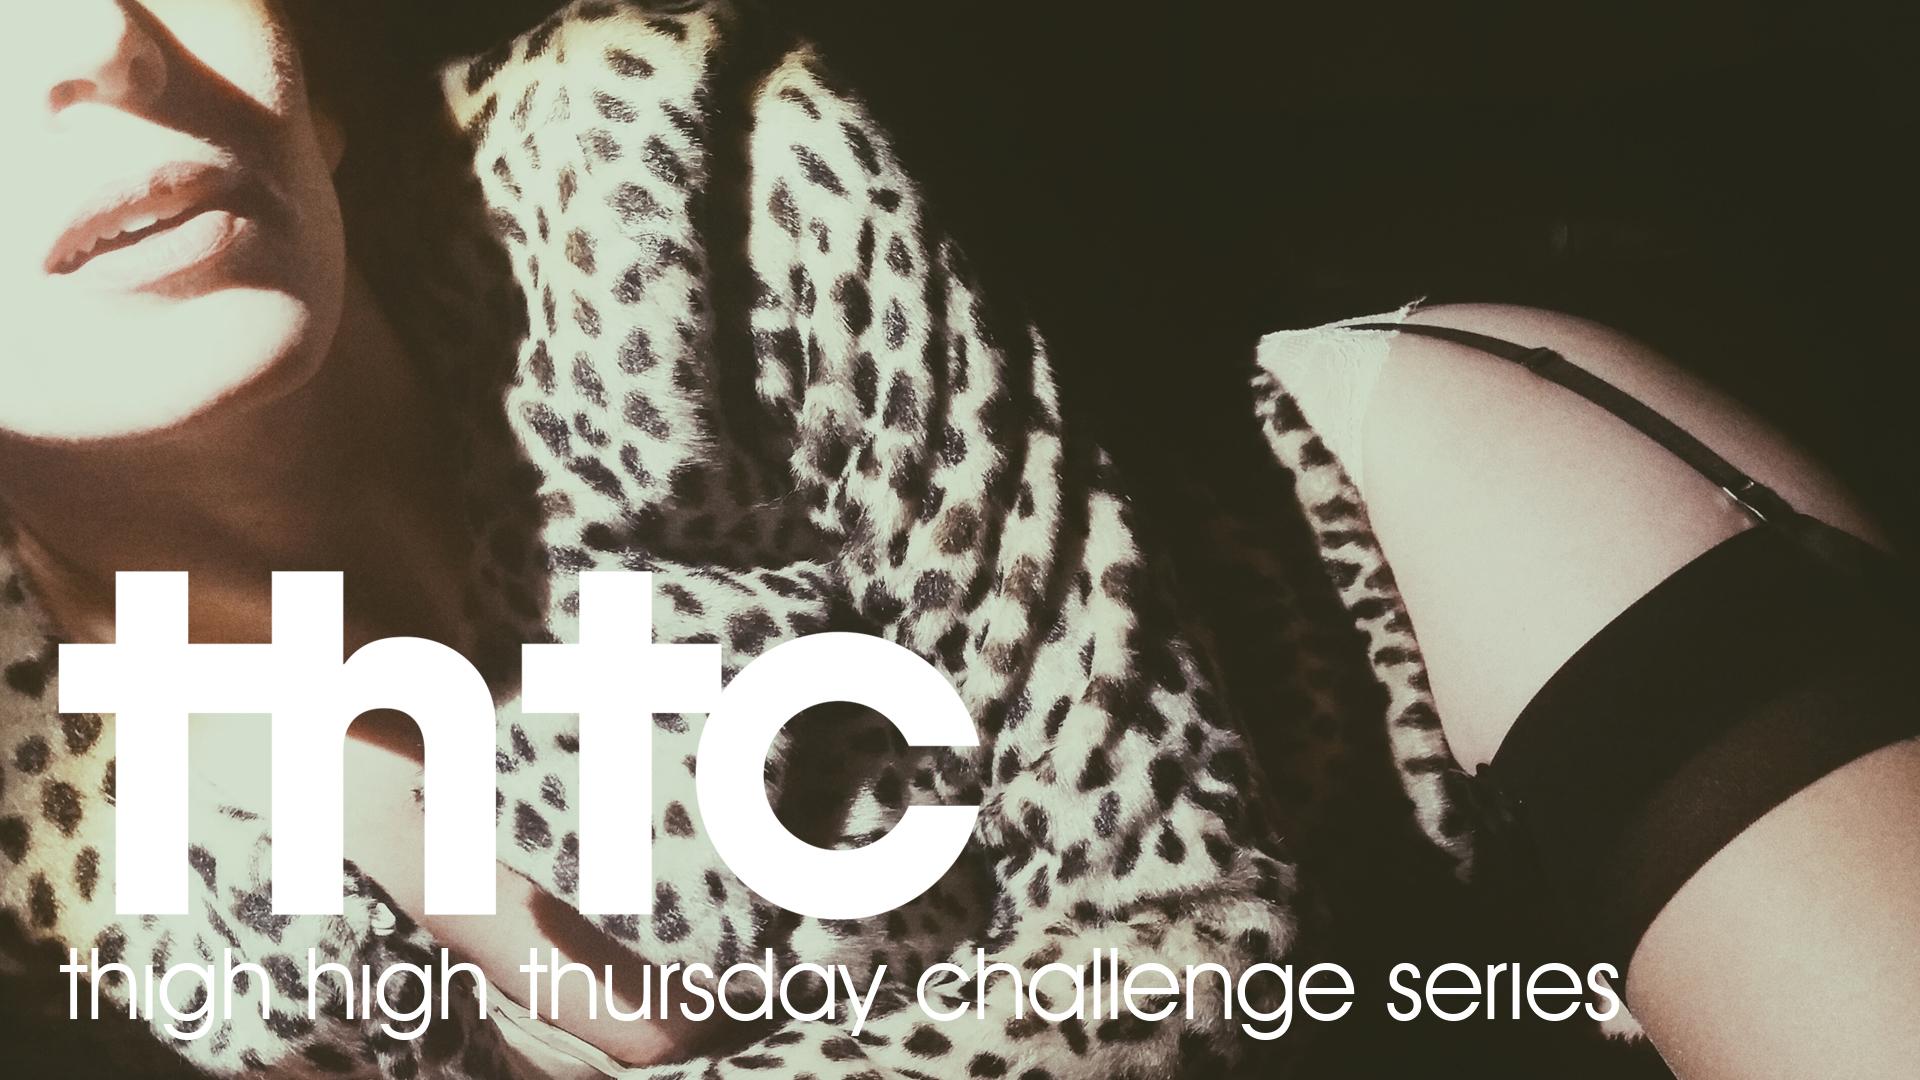 Thigh High Thursday Challenge Series